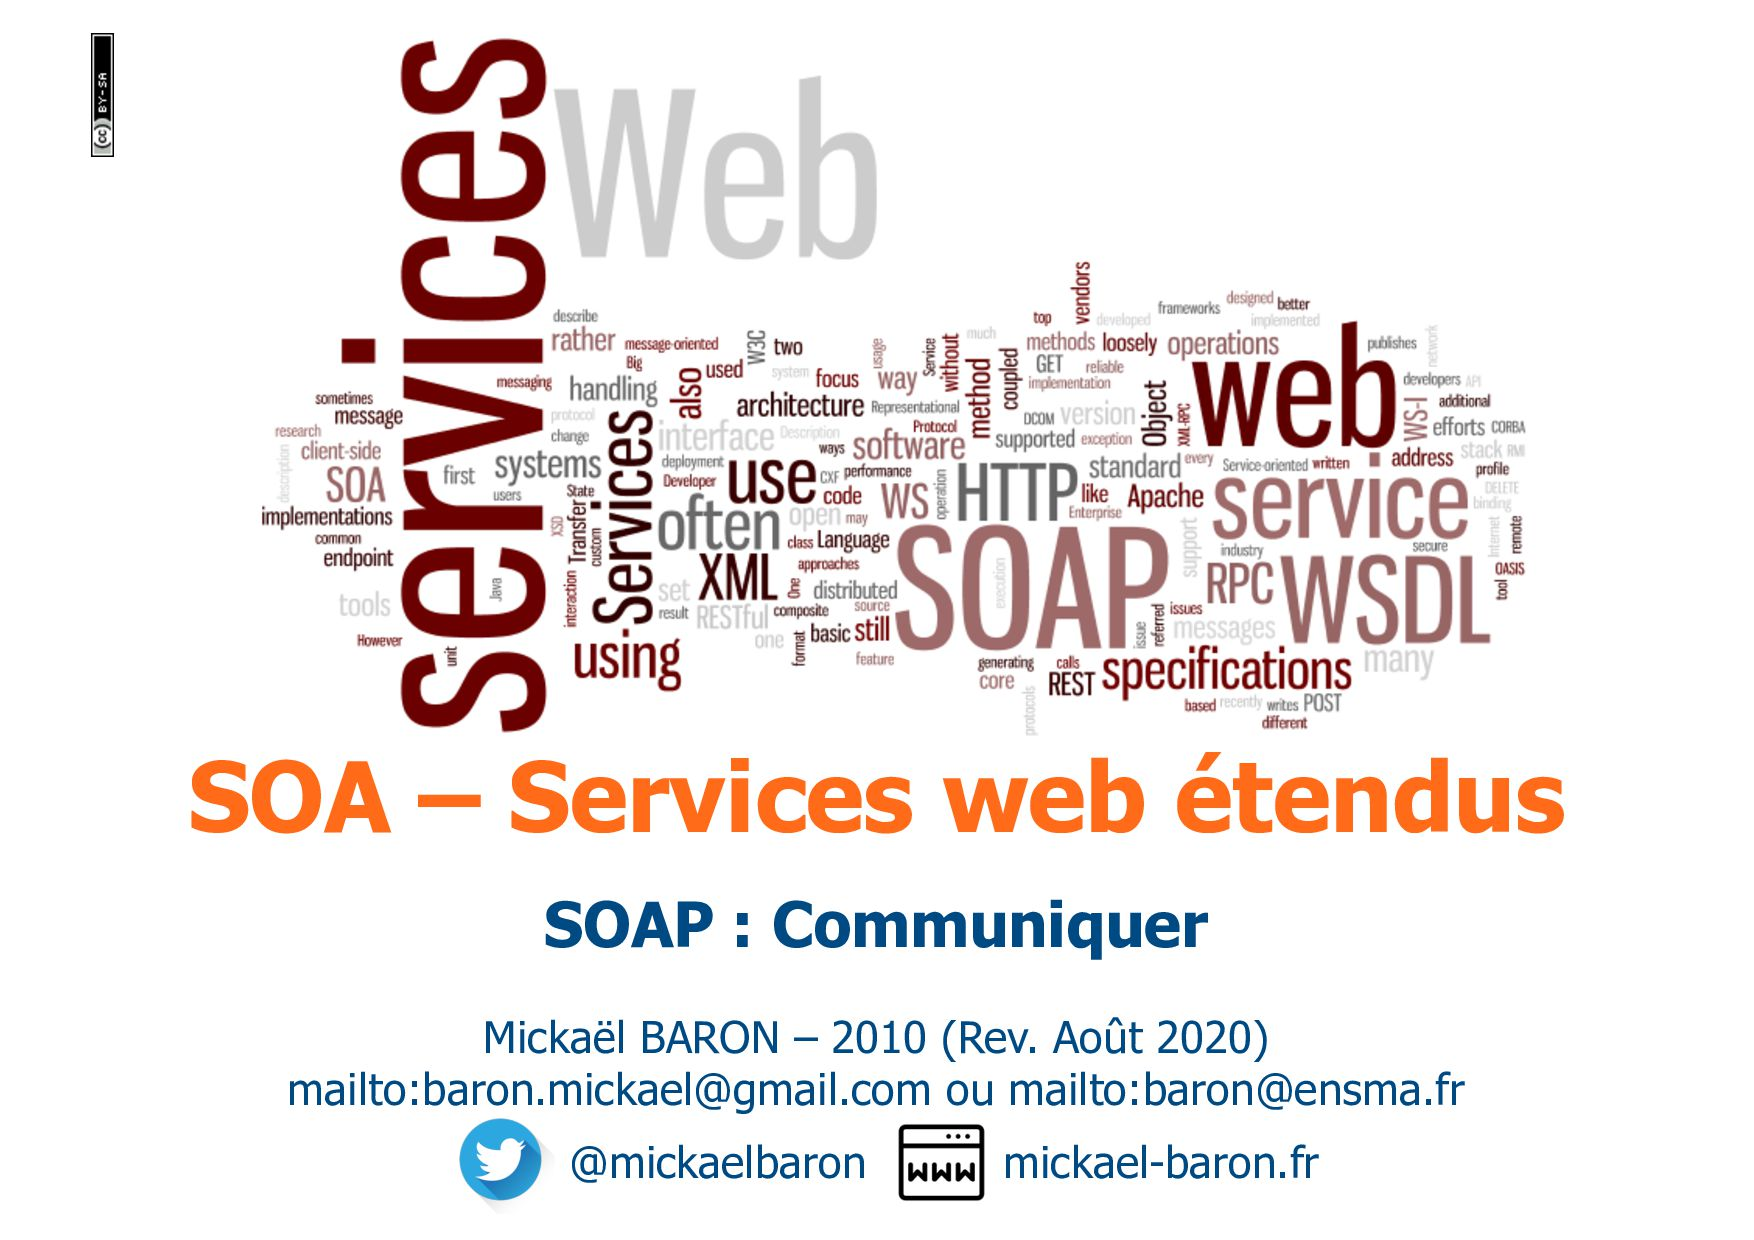 SOA – Services web étendus Mickaël BARON – 2010...